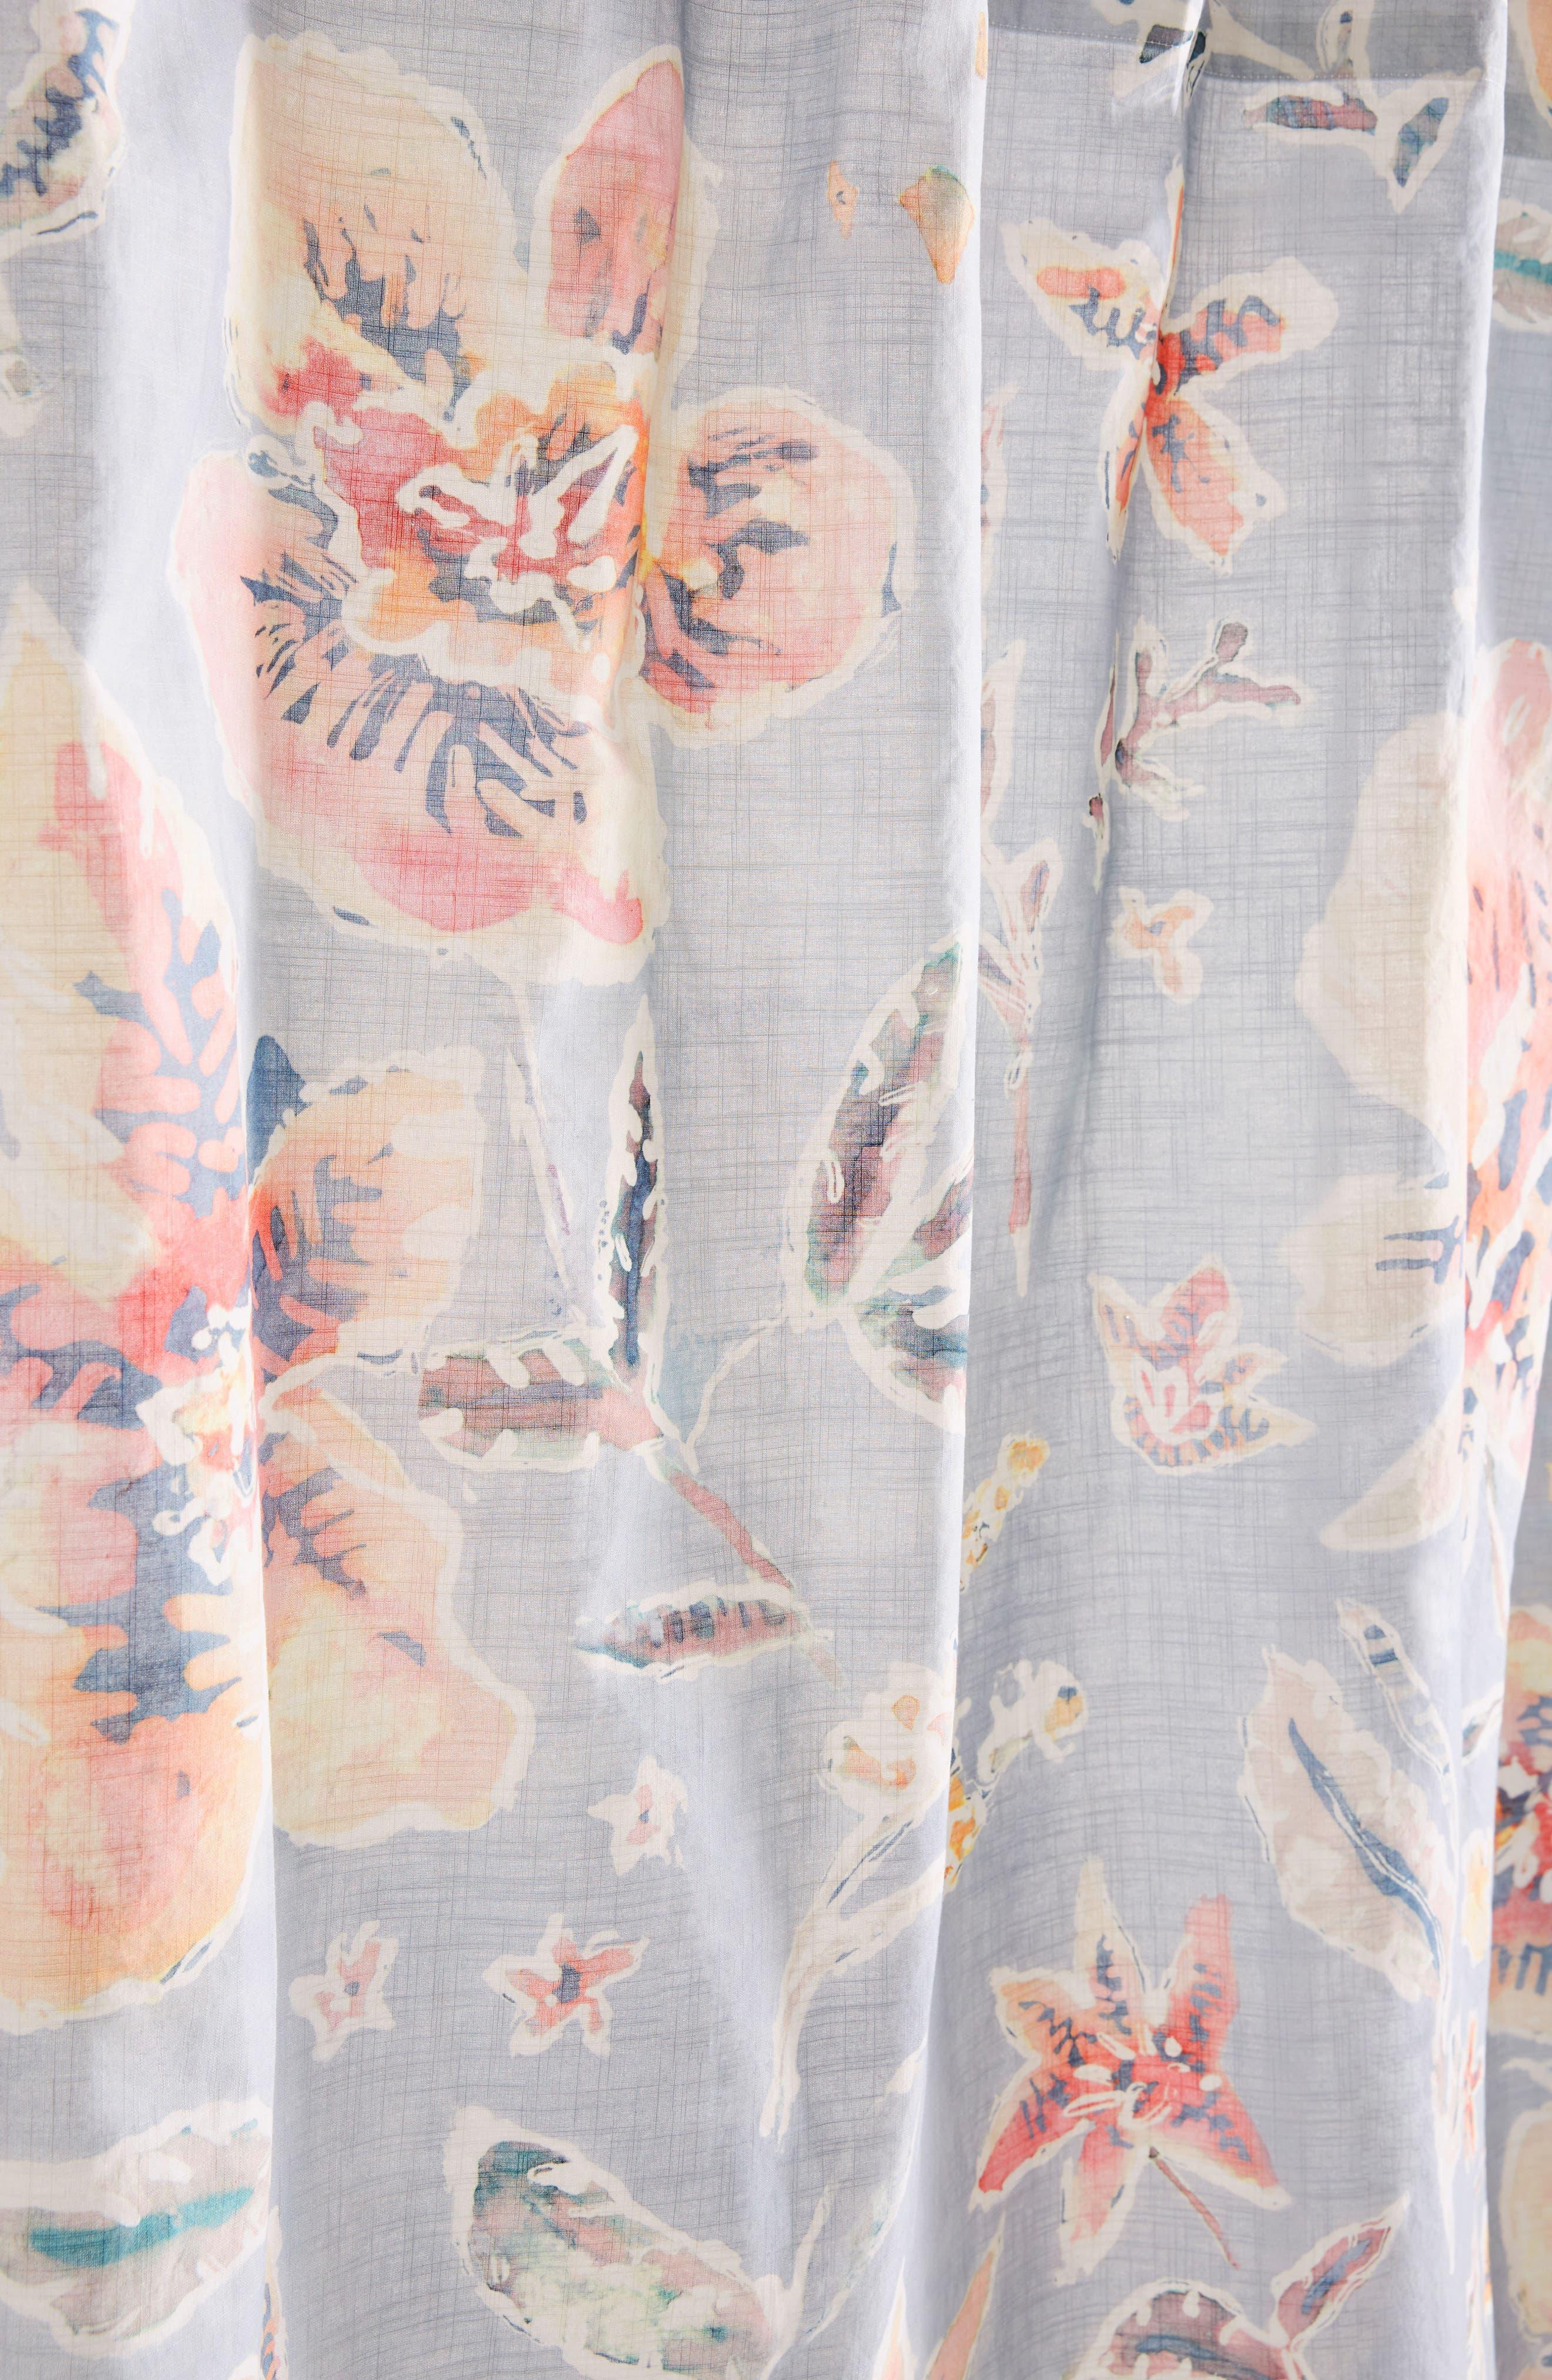 Winslow Shower Curtain,                             Alternate thumbnail 2, color,                             400